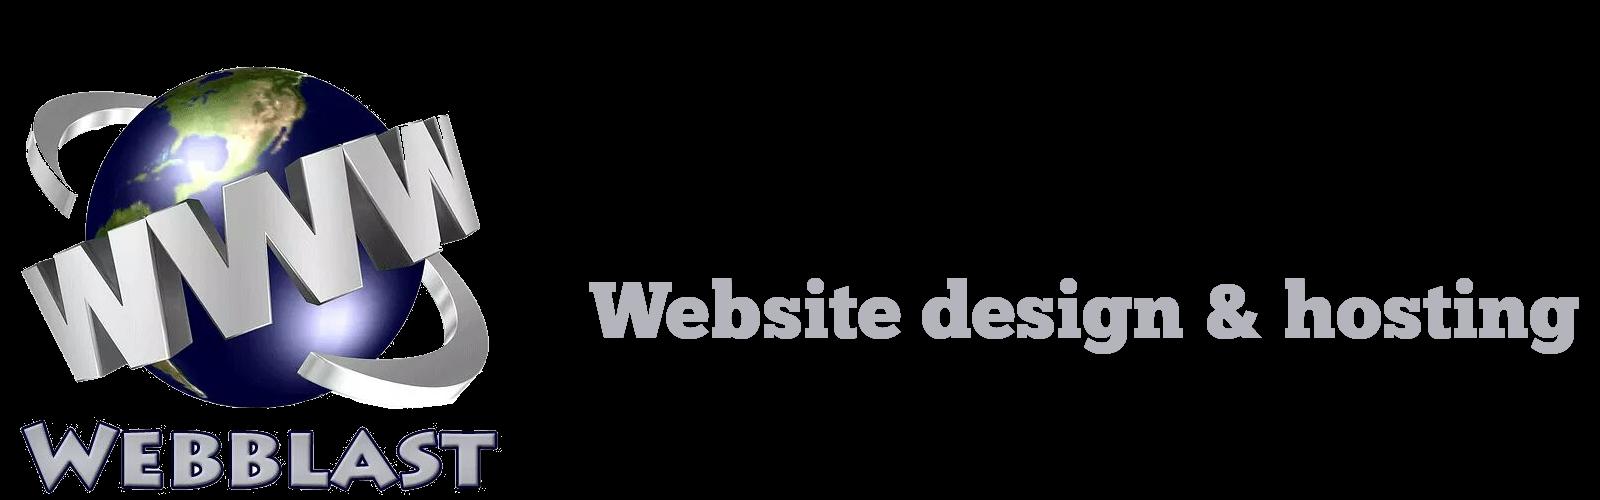 Webblast